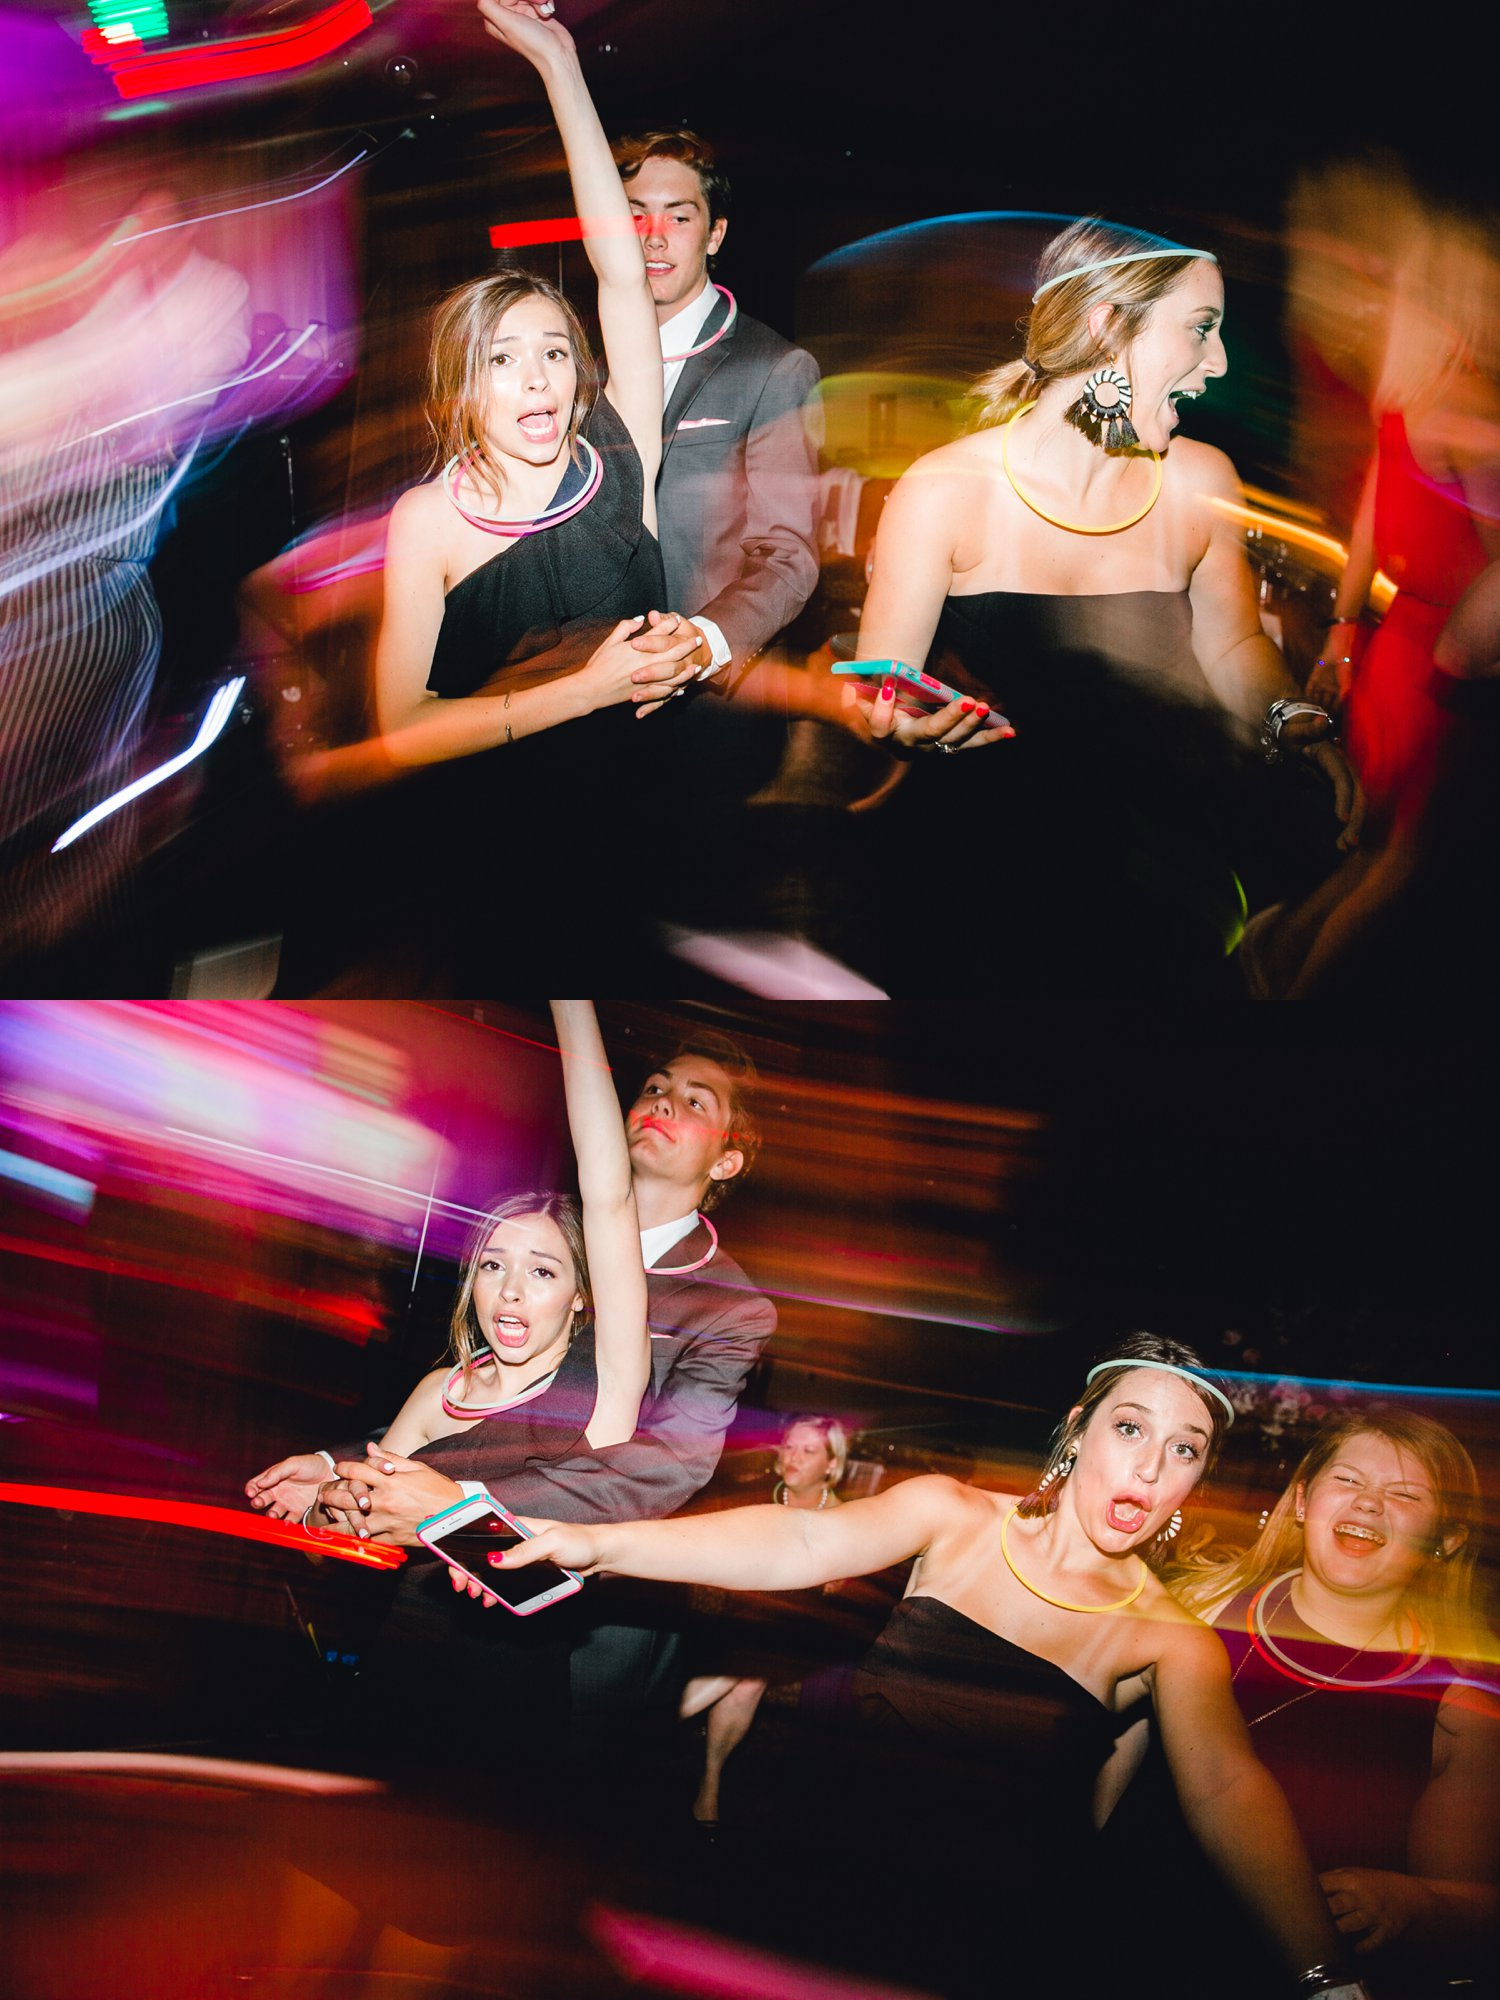 Taylor-and-Brock-Williams-Texas-Tech-University-Merket-Alumni-Center-Lubbock-Photographer-ALLEEJ0248.jpg